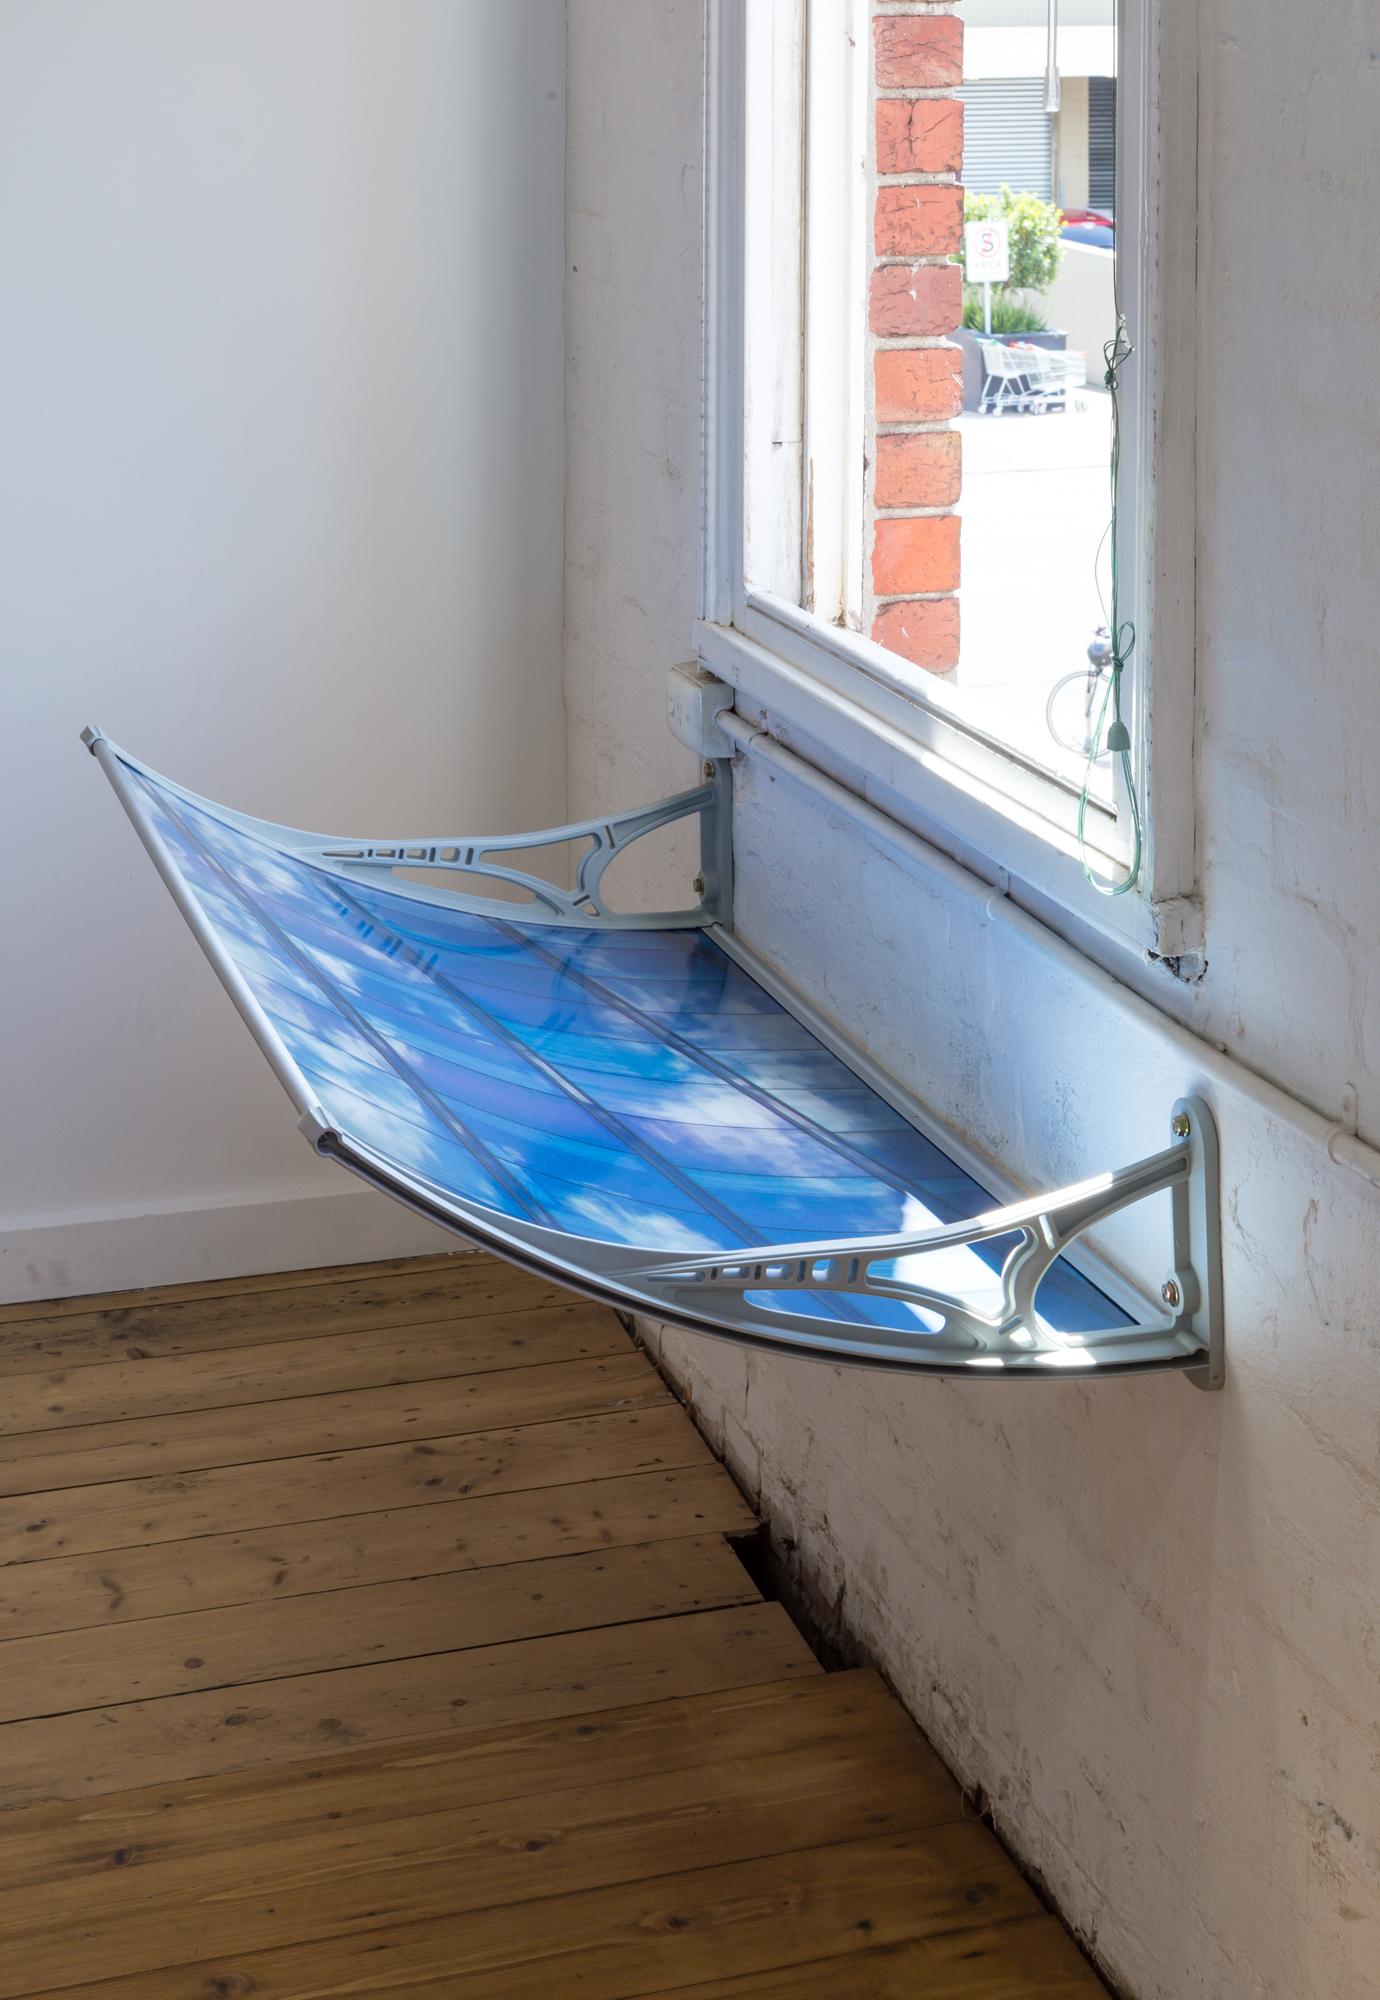 Objective Image, 2017, digital print, polycarbonate canopy  Photo by André Piguet